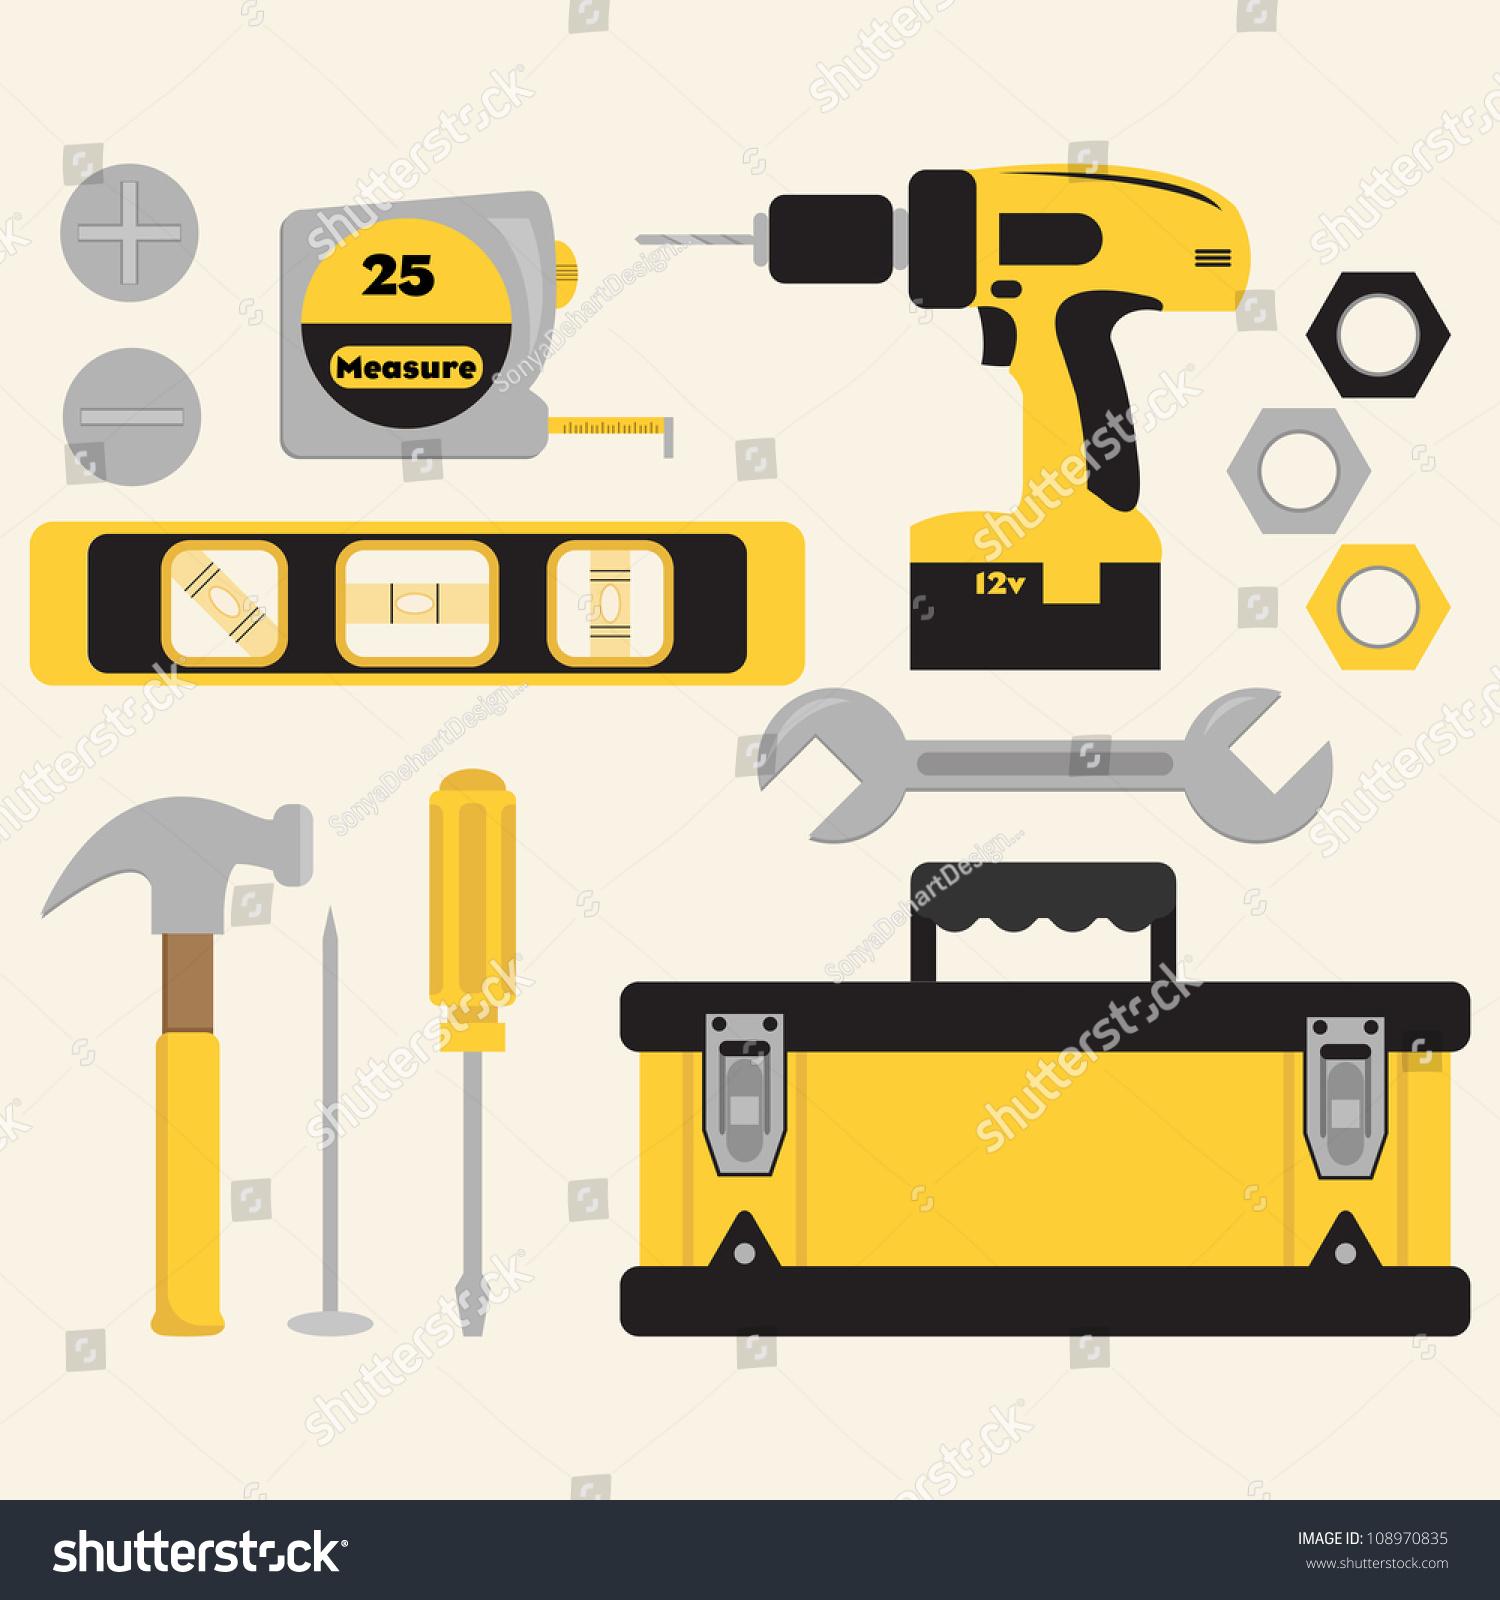 Clip Art Tools Toolbox Set Stock Vector 108970835 - Shutterstock